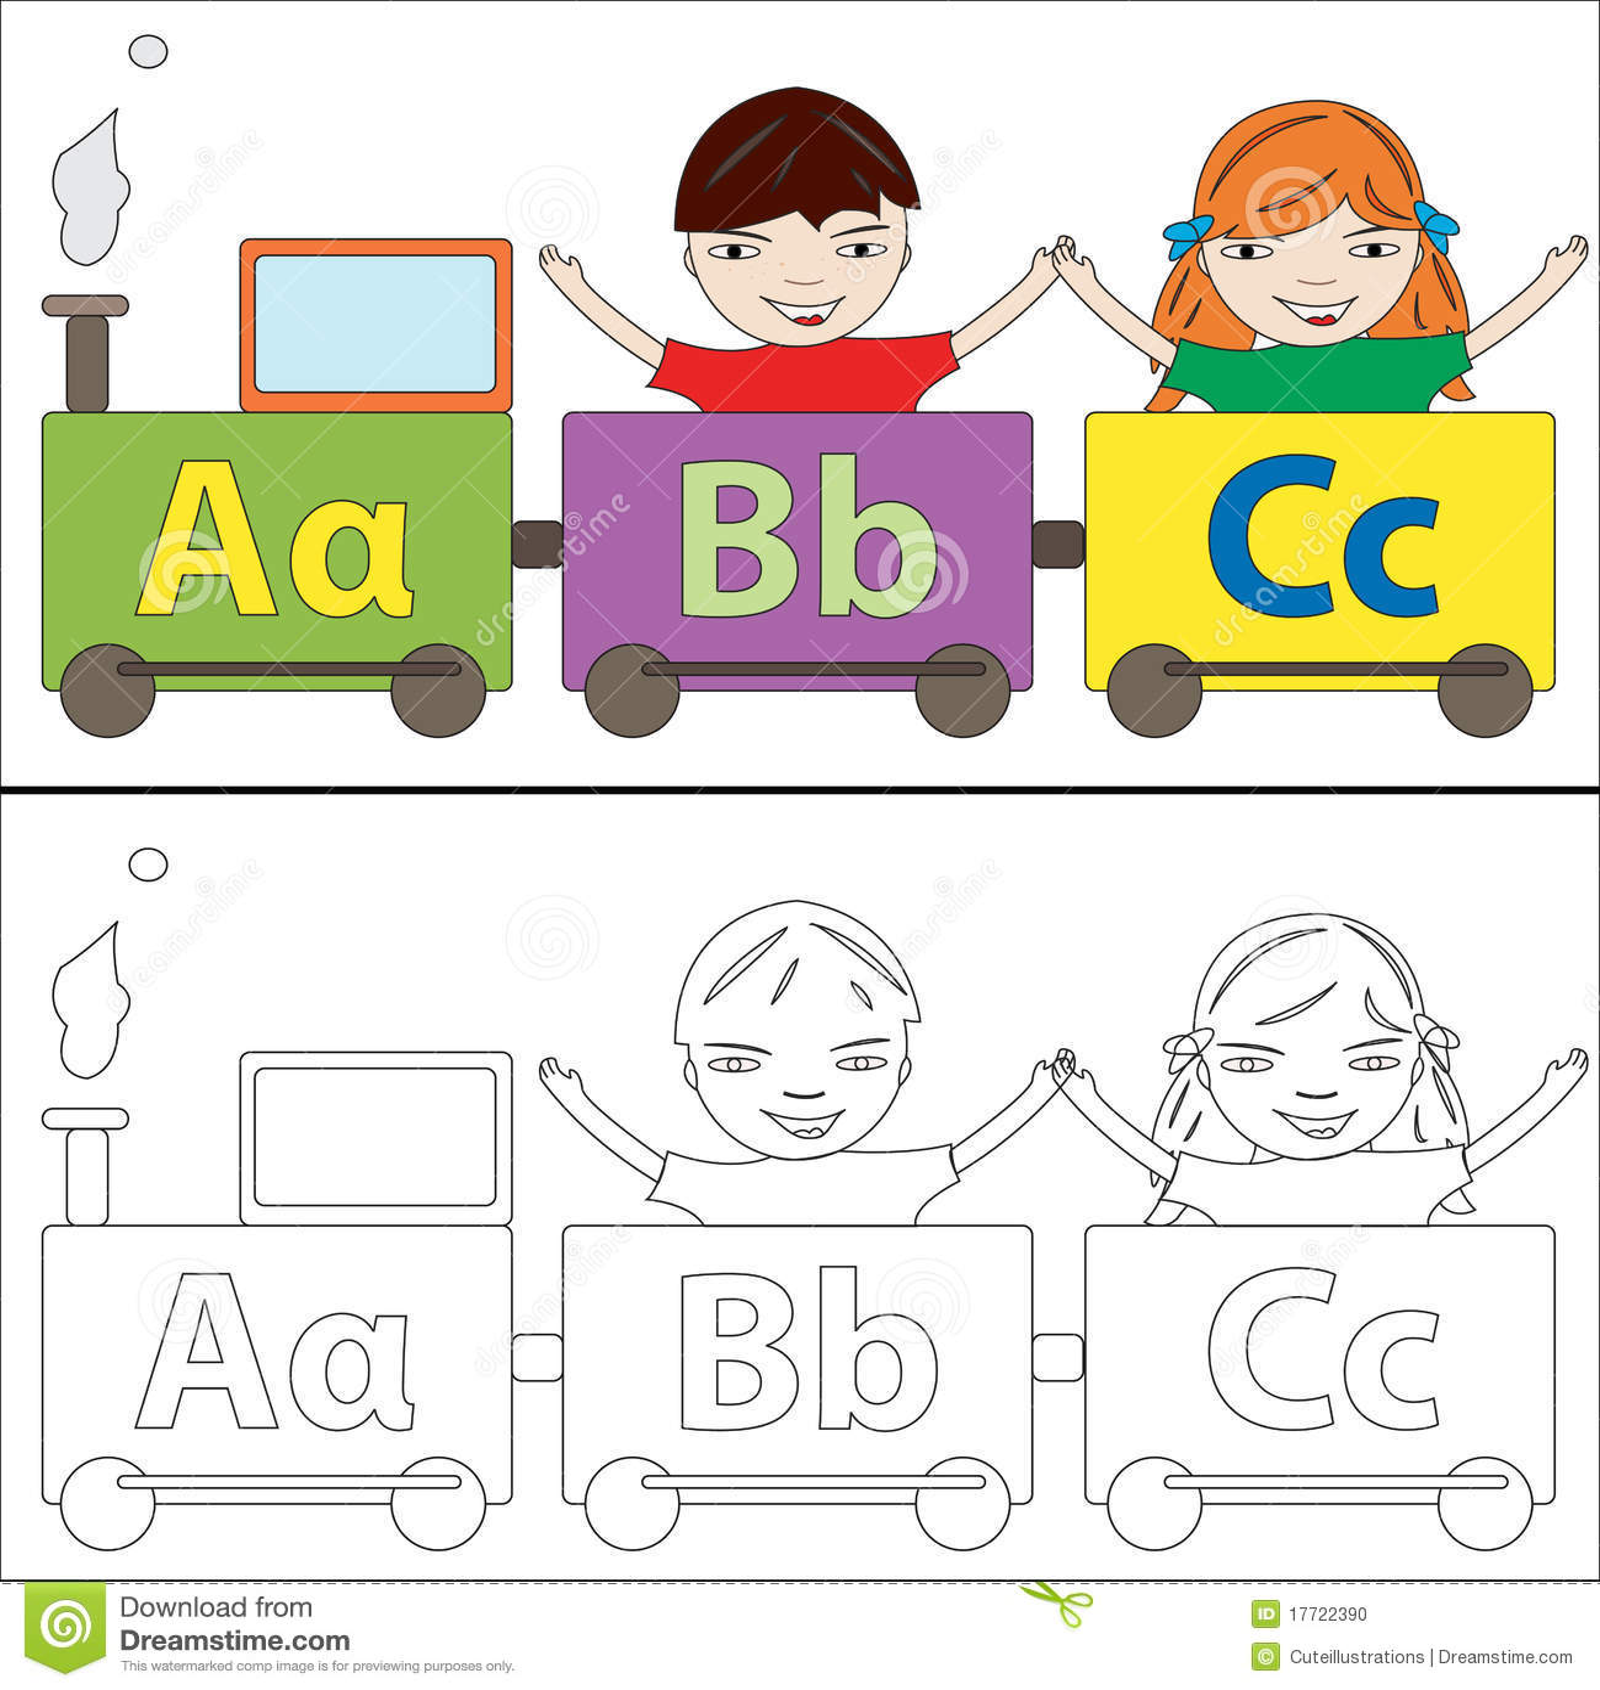 Alphabet train coloring - Alphabet Train Stock Photo